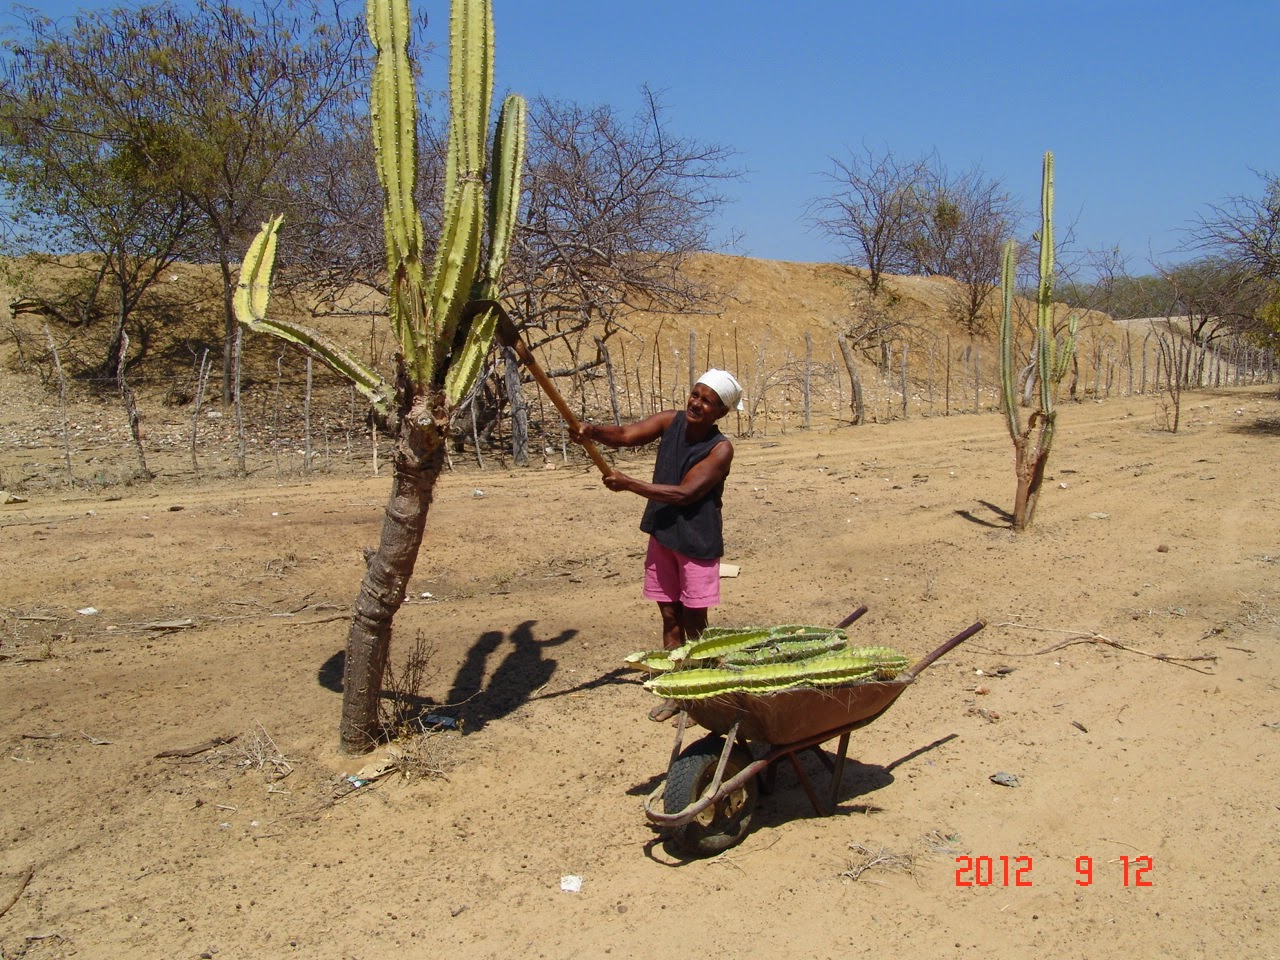 O corte do mandacaru na seca